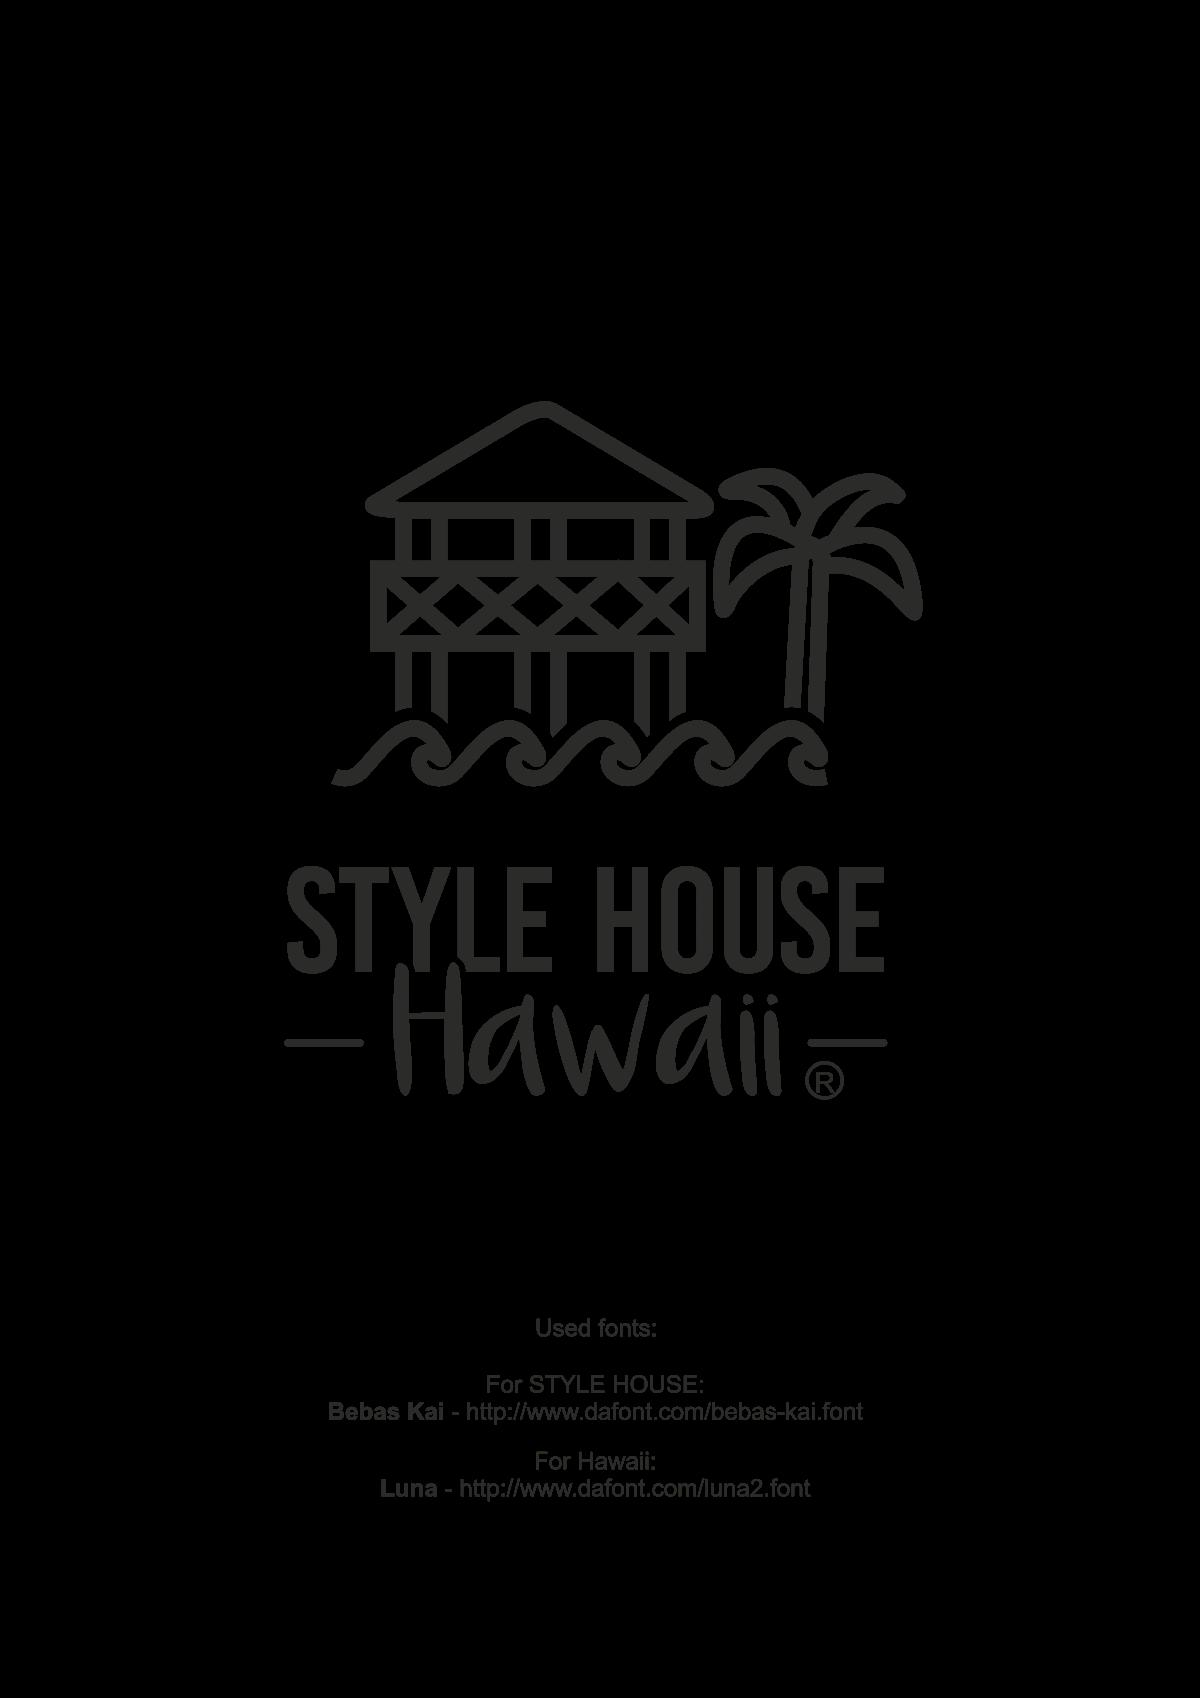 Style House Hawaii